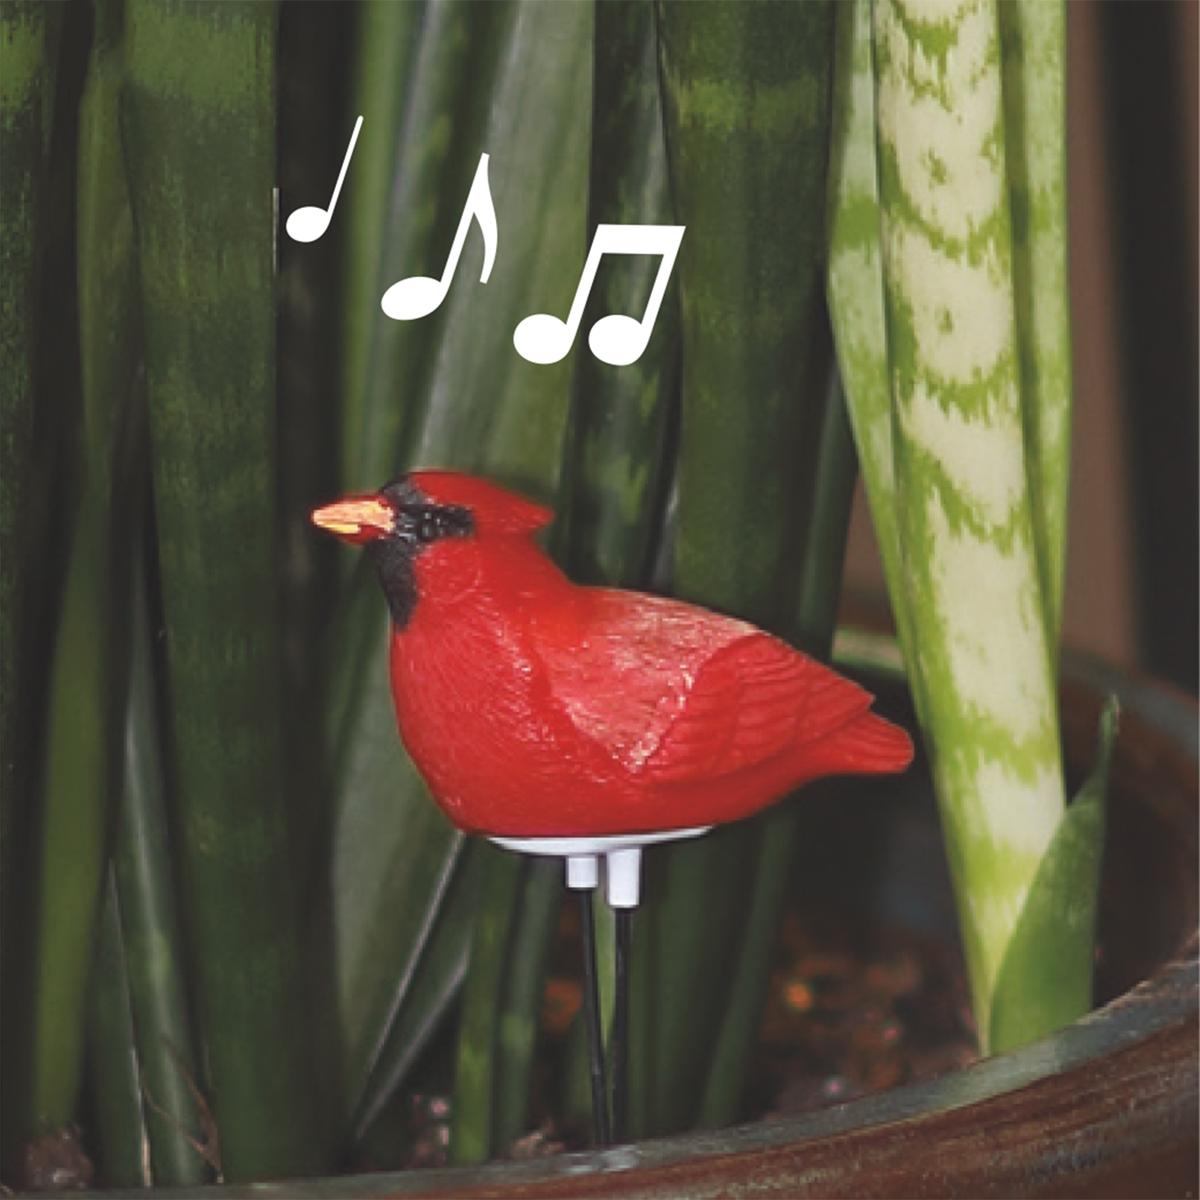 Cardinal Moisture Meter